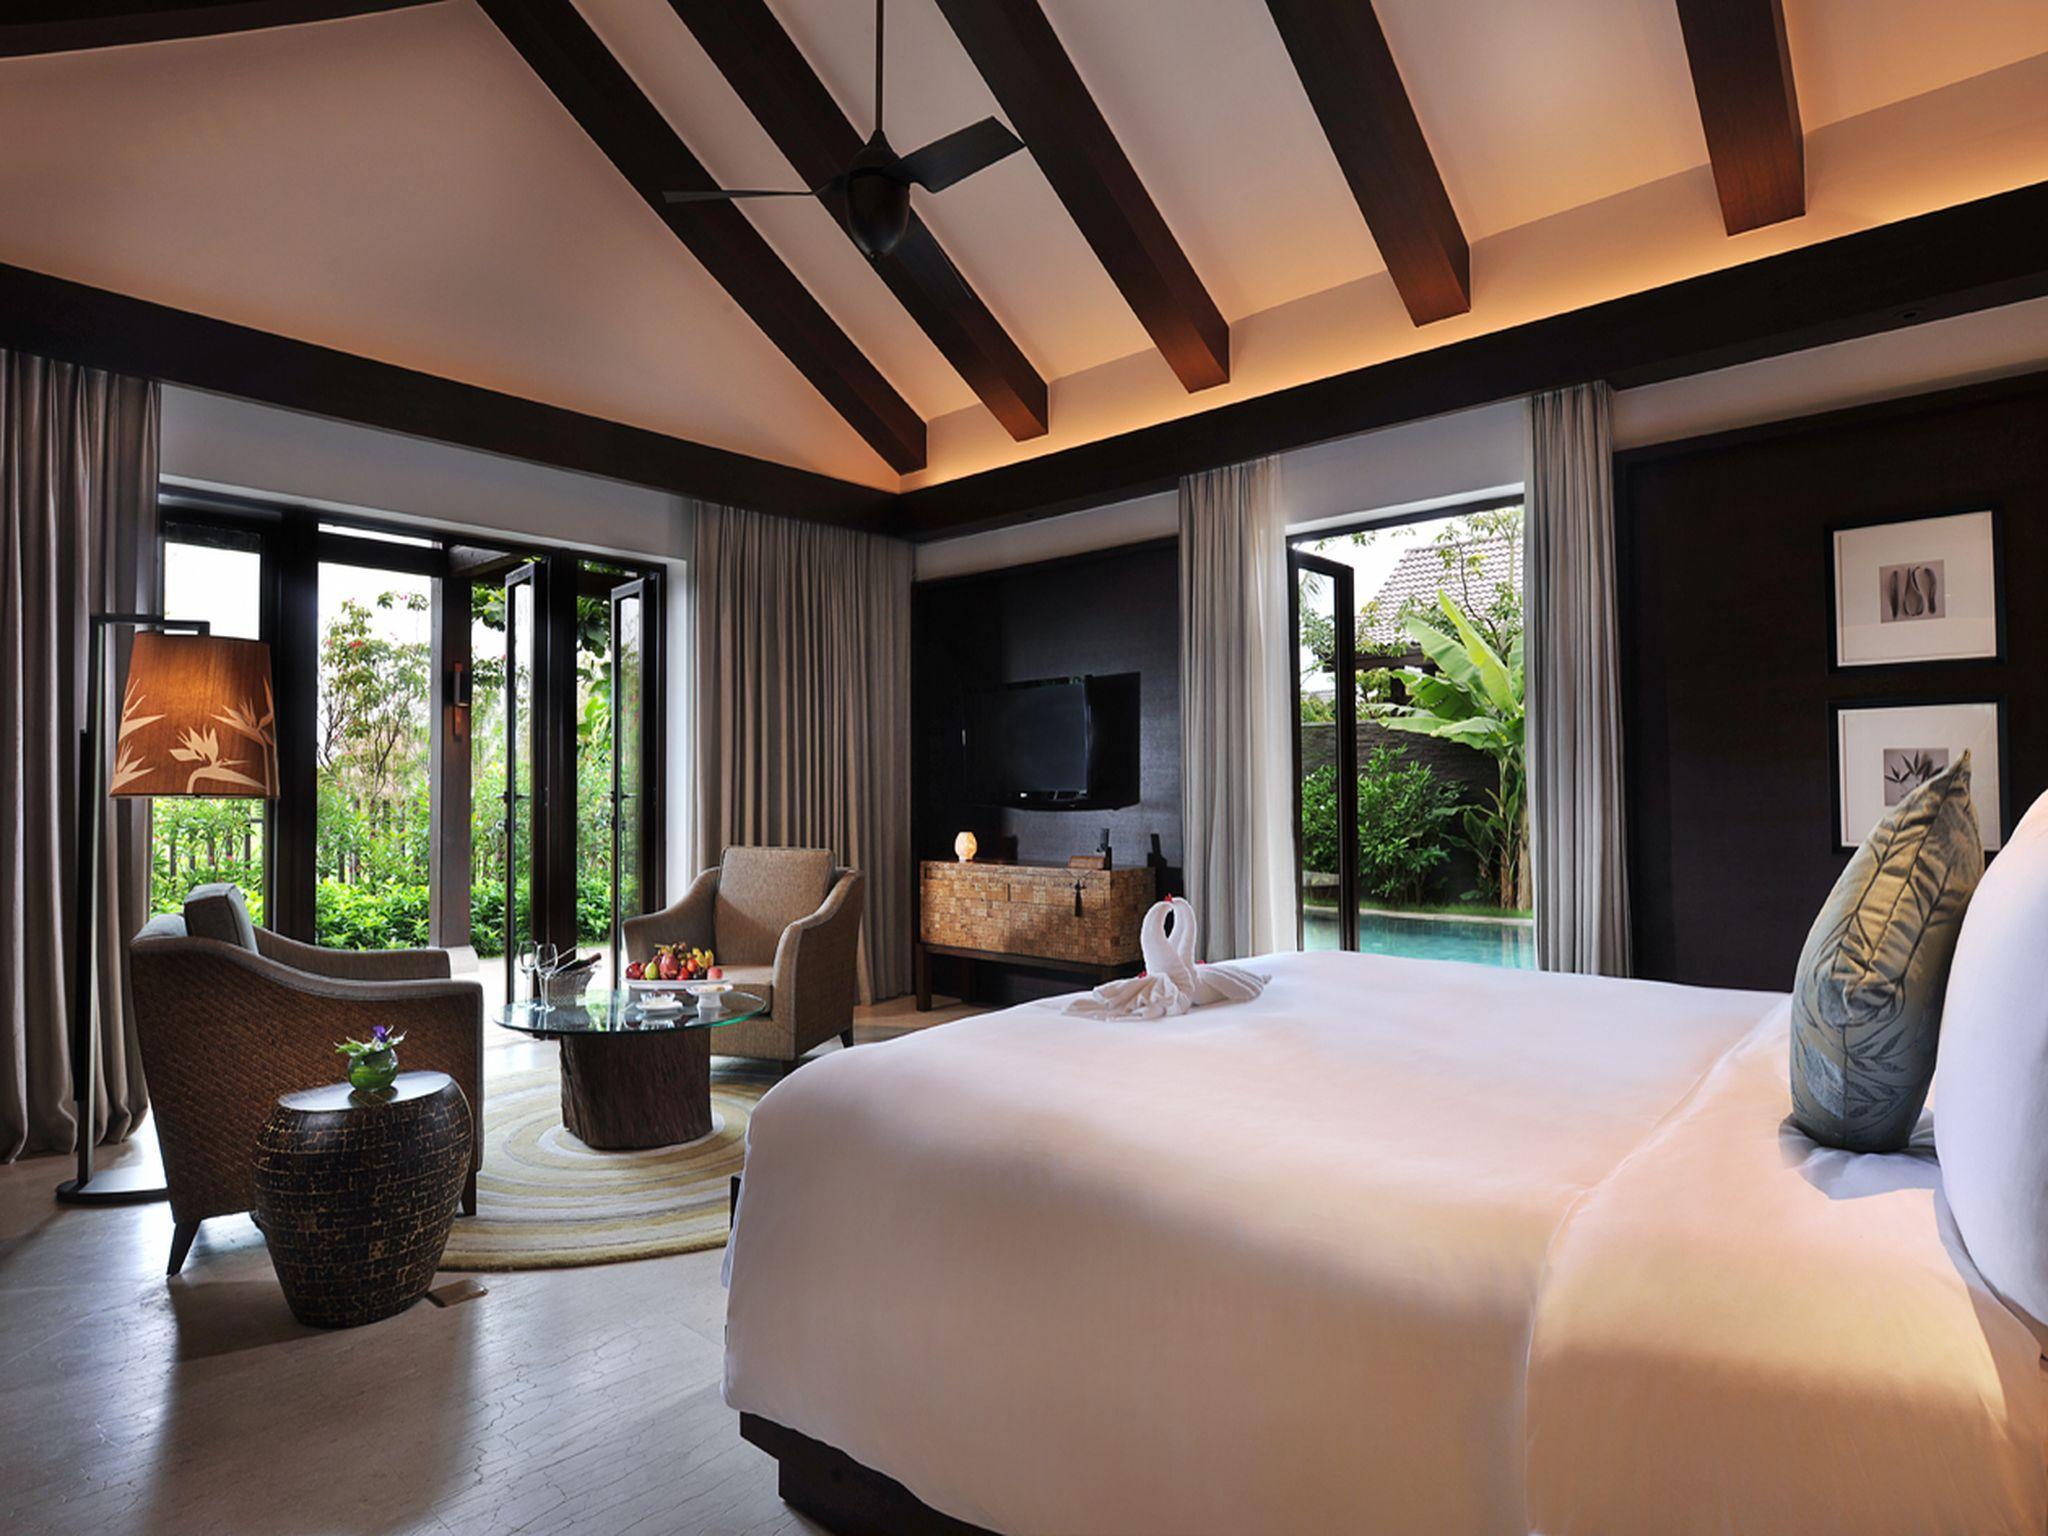 Best Price on Narada Resort & Spa Perfume Bay in Sanya + Reviews